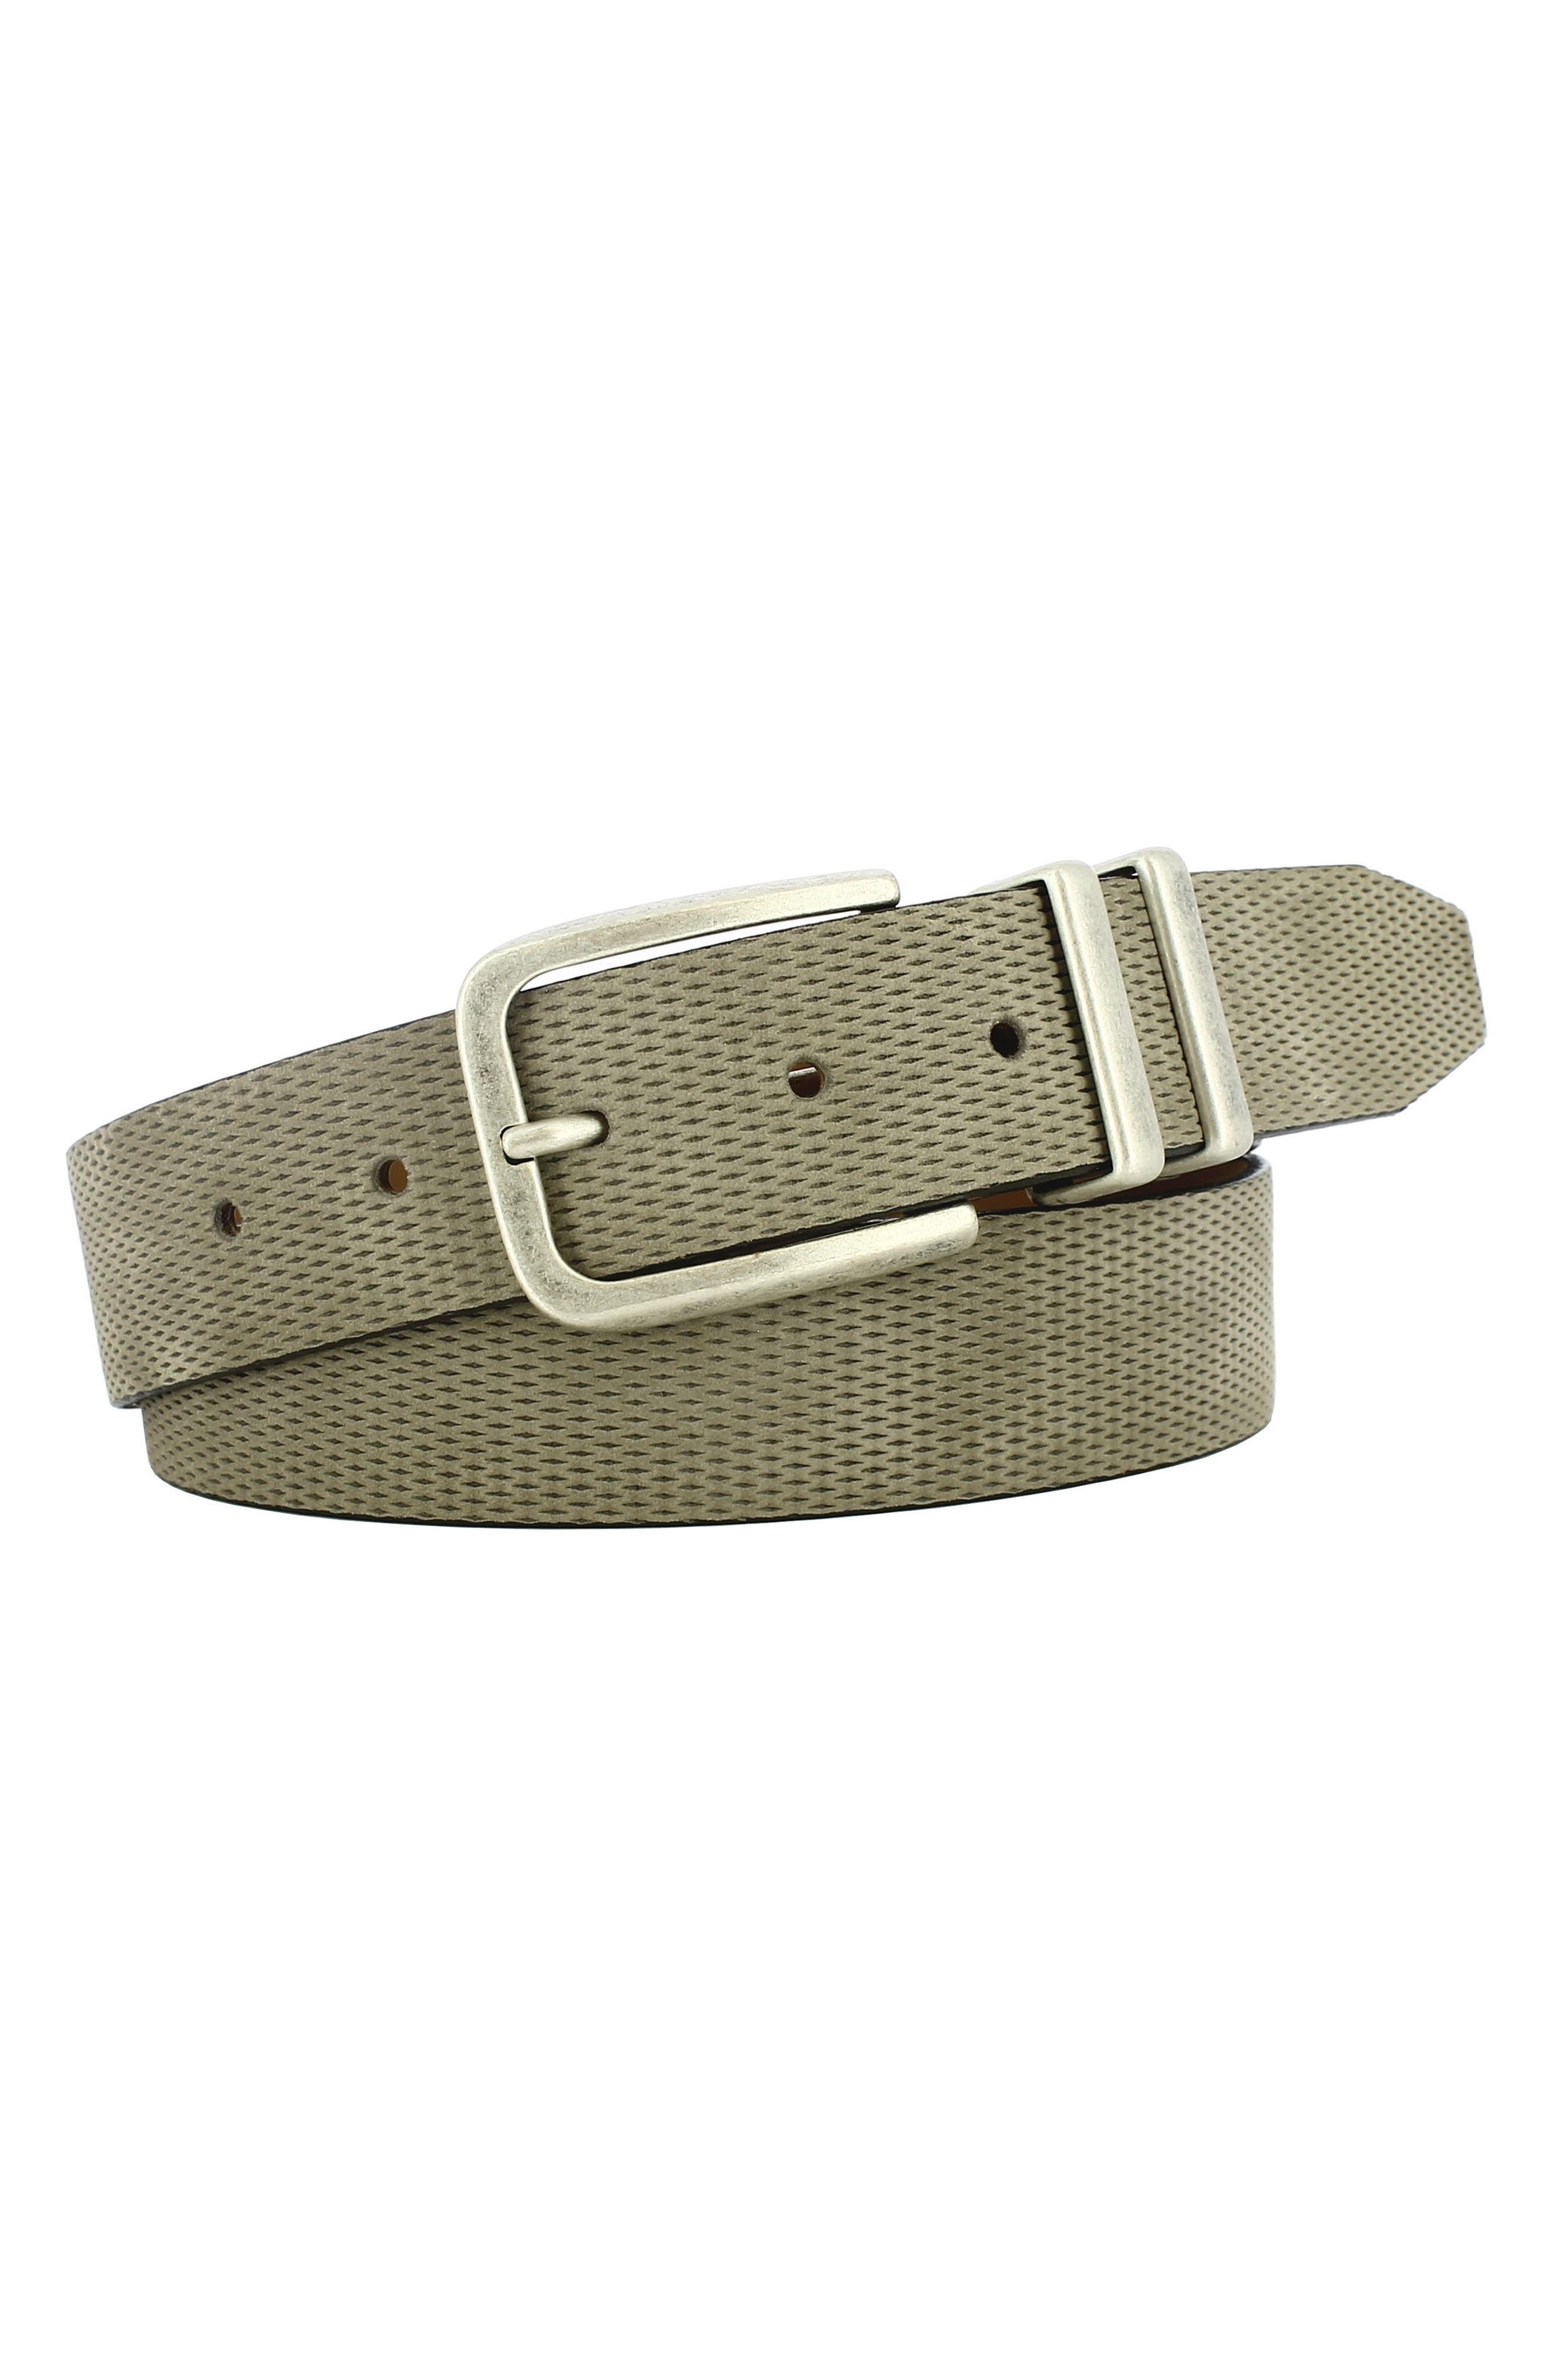 Remo Tulliani Axel Textured Leather Belt, Tan